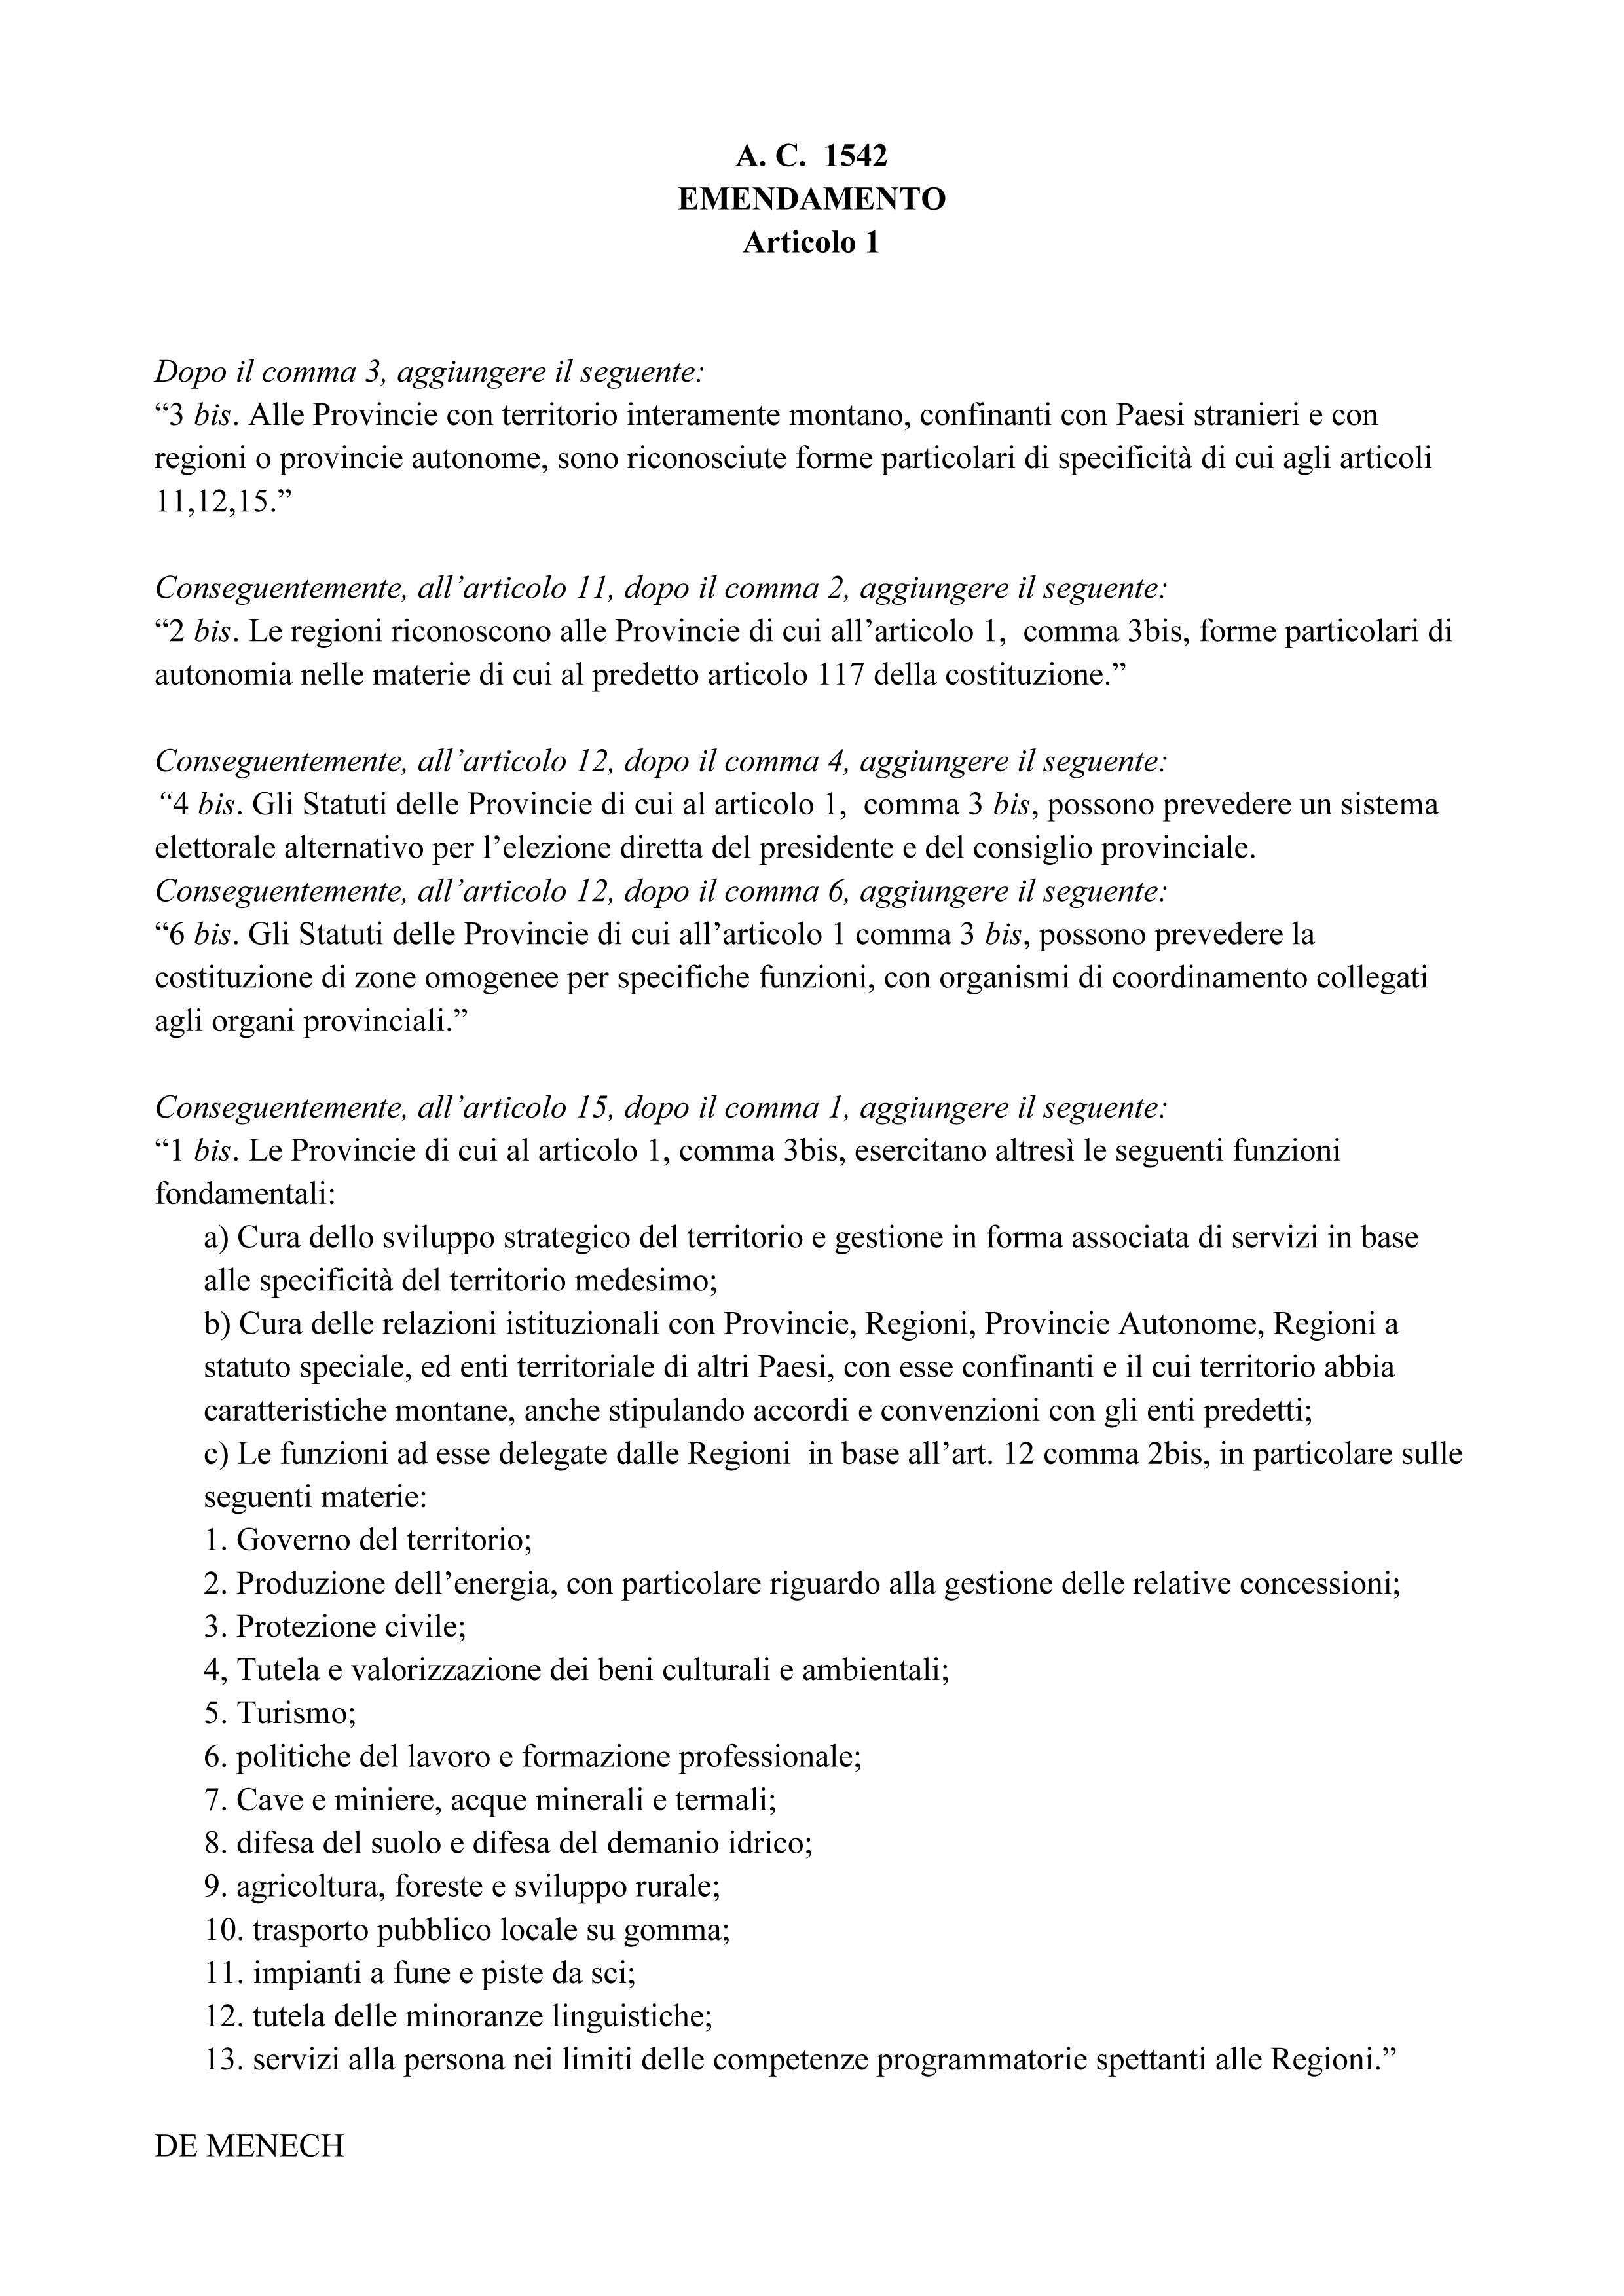 Emendamento Presentato da DE MENECH